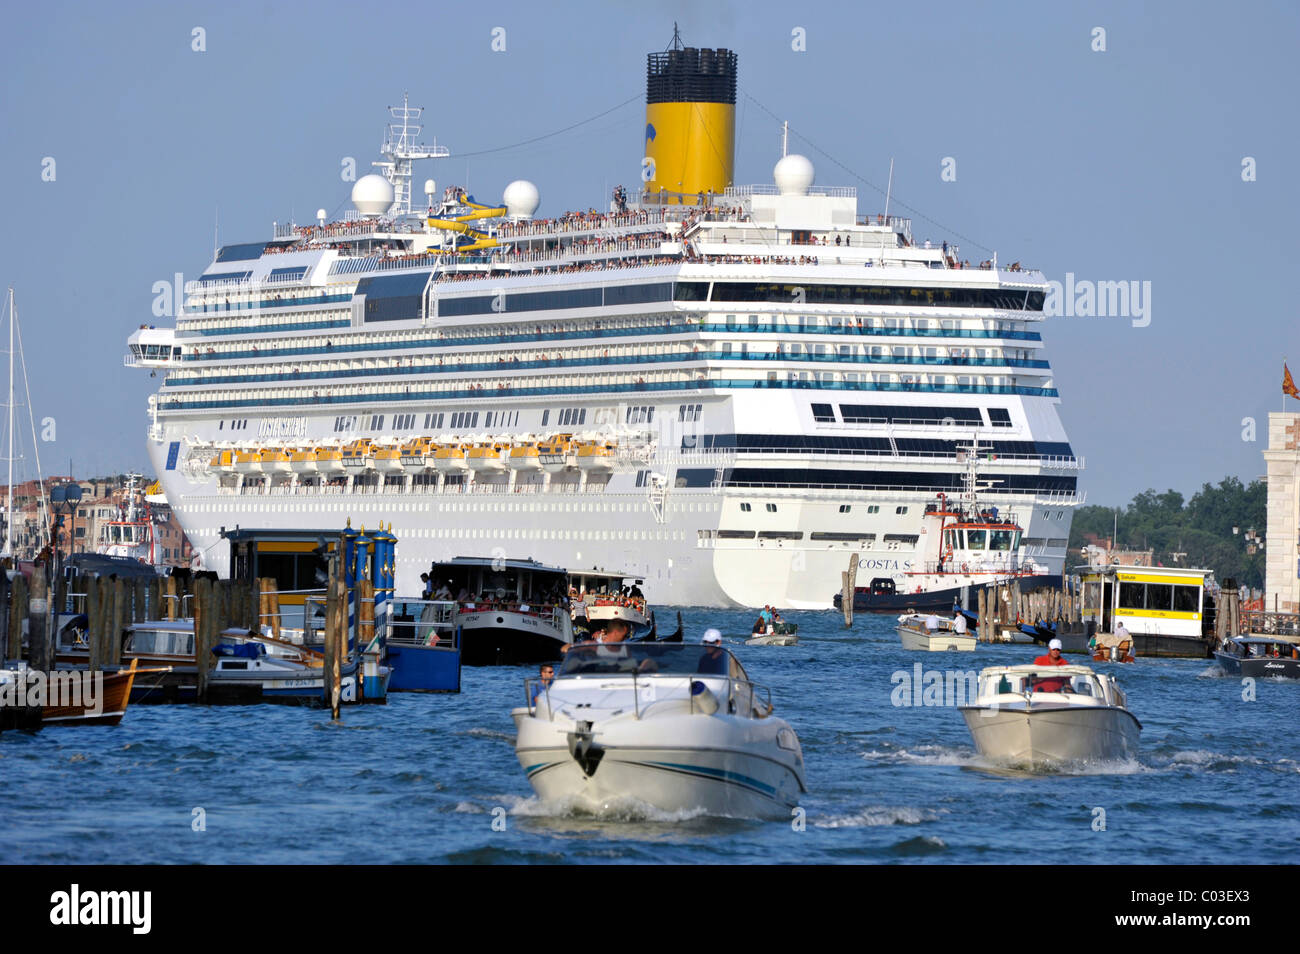 Marco cruise